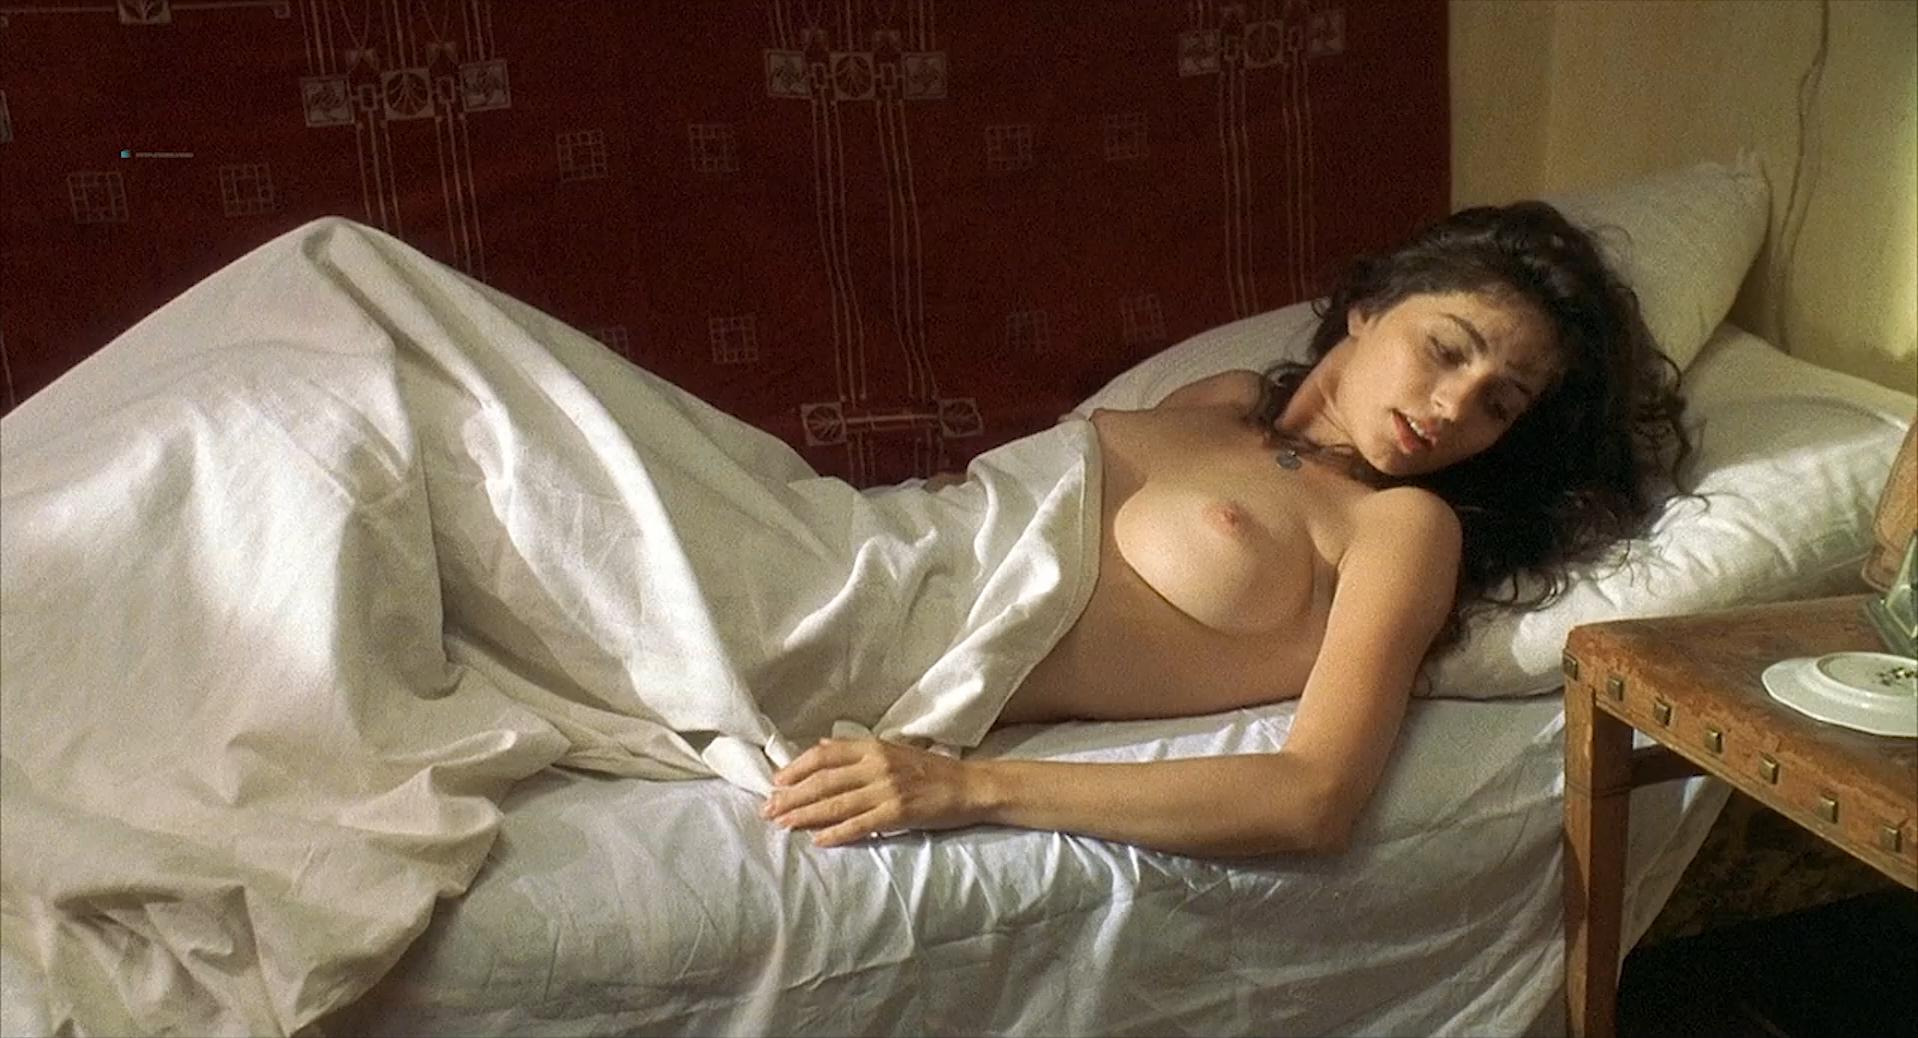 Erika marozsan nude